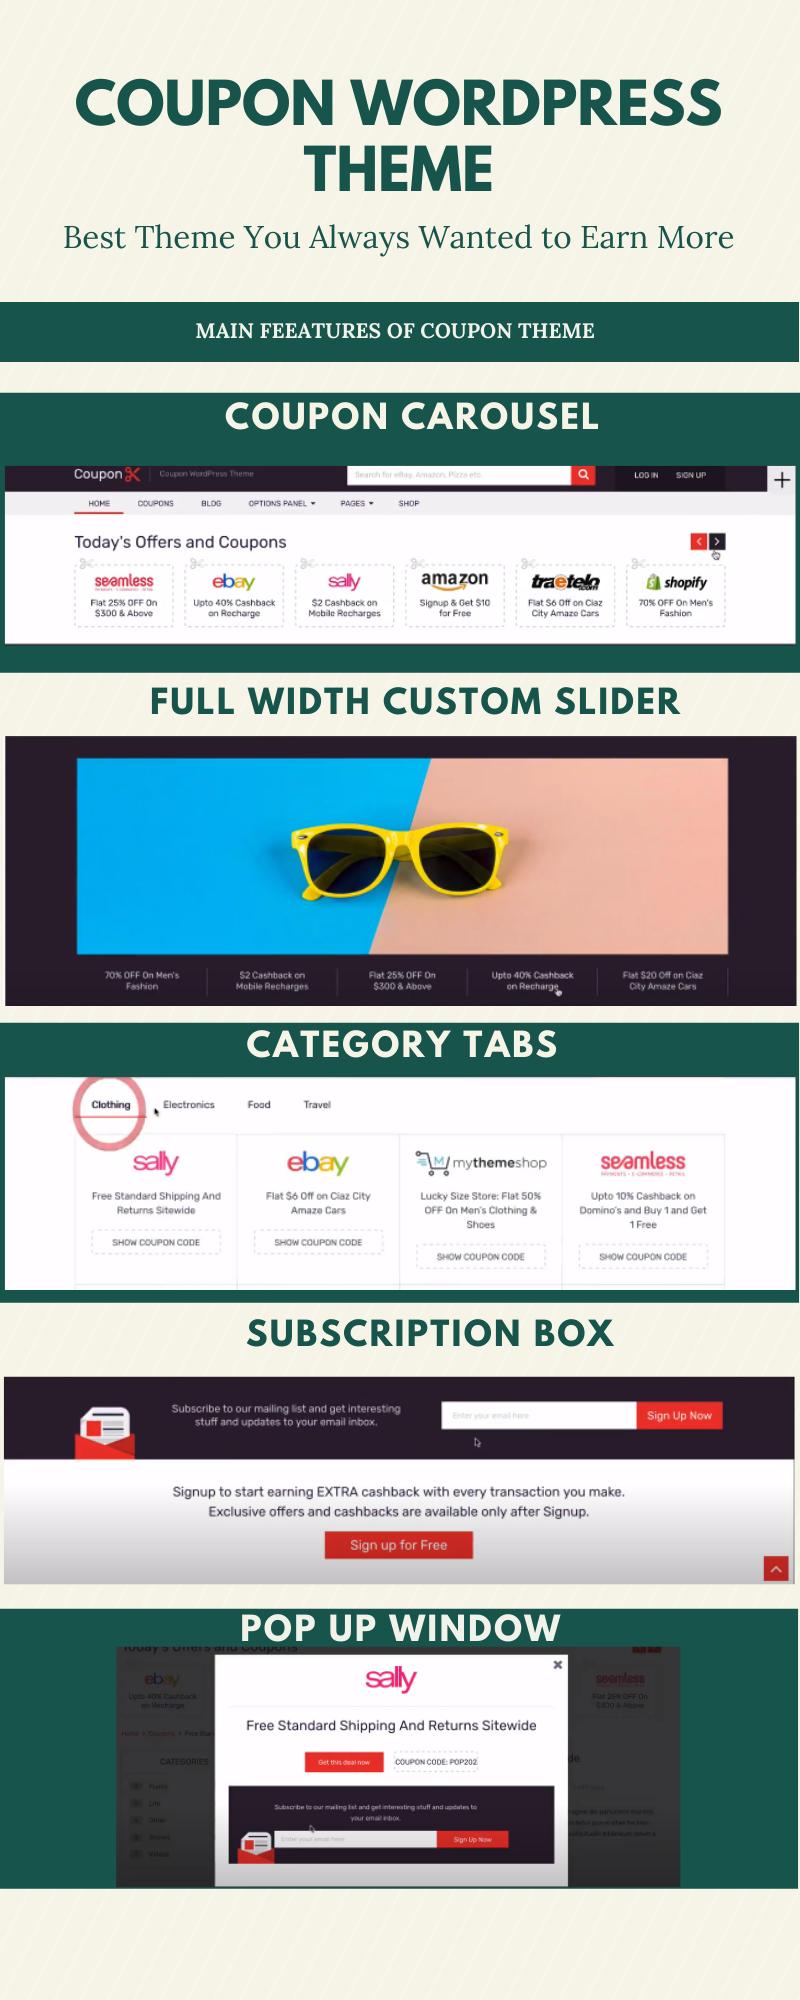 Best coupon wordpress theme from mythemeshop